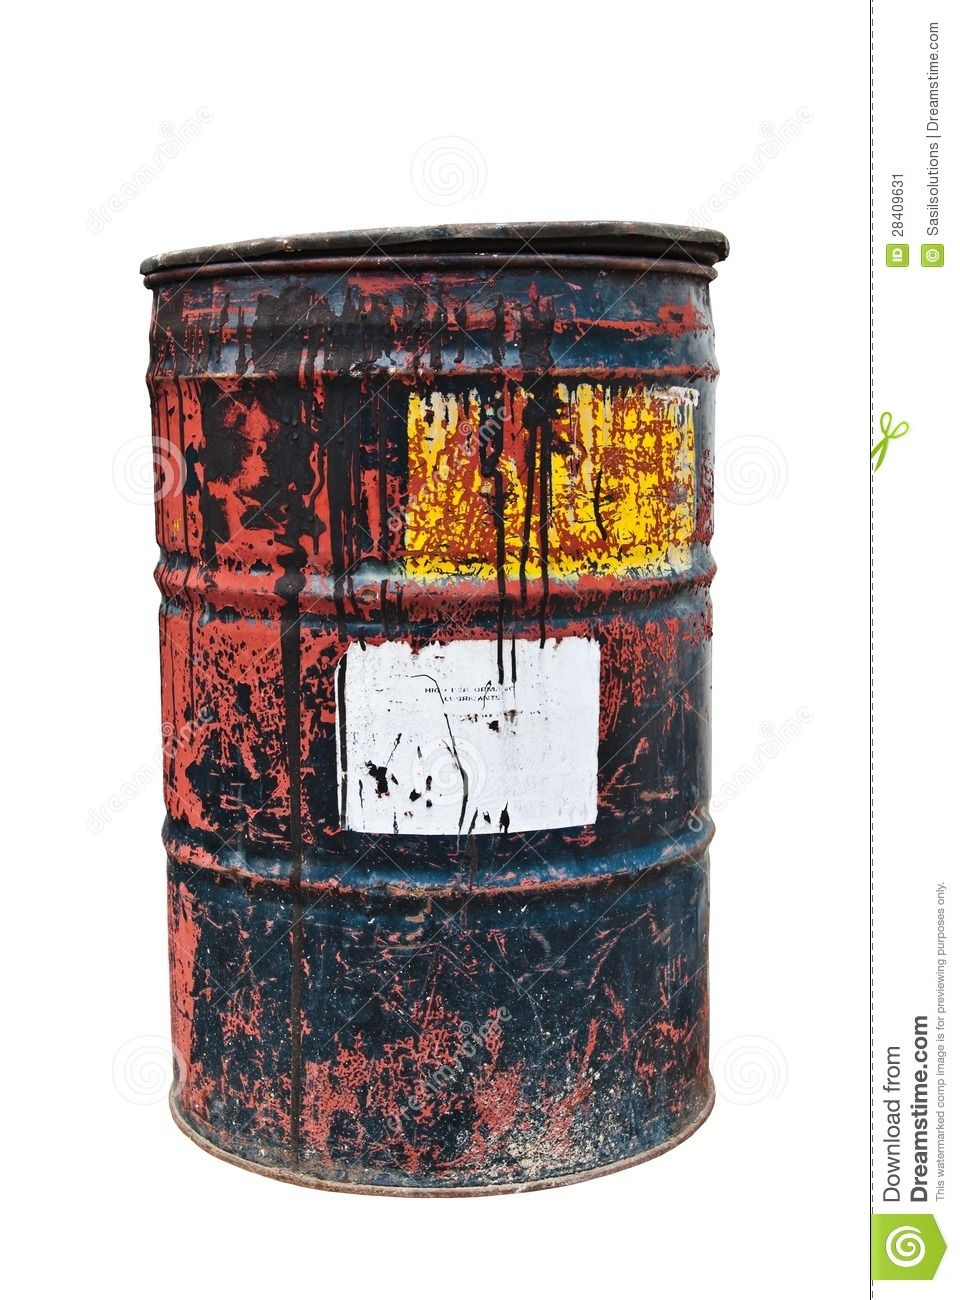 Rusty corroded barrel